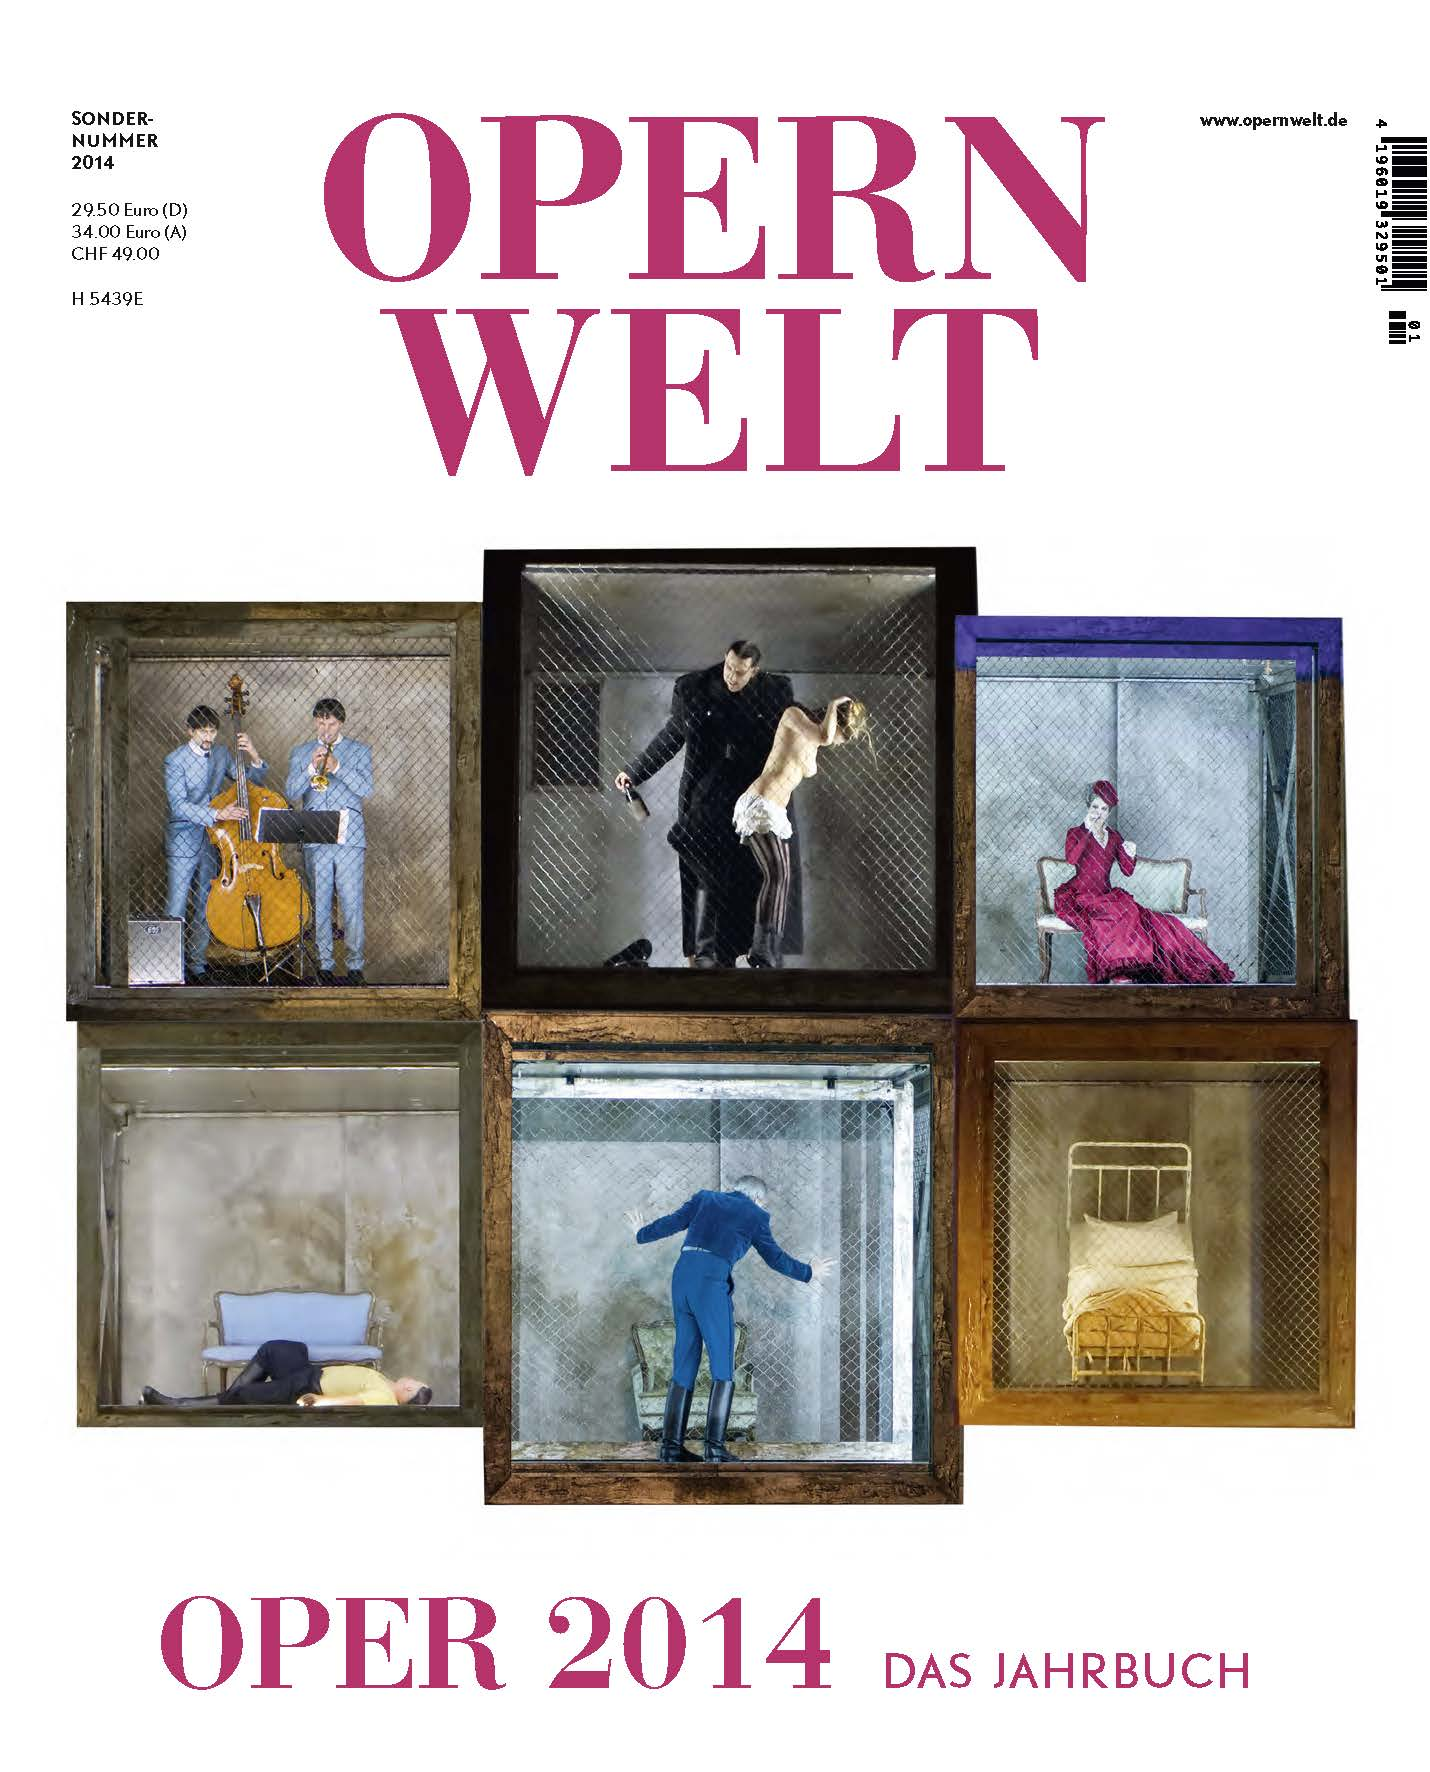 Opernwelt Jahrbuch (13/2014)